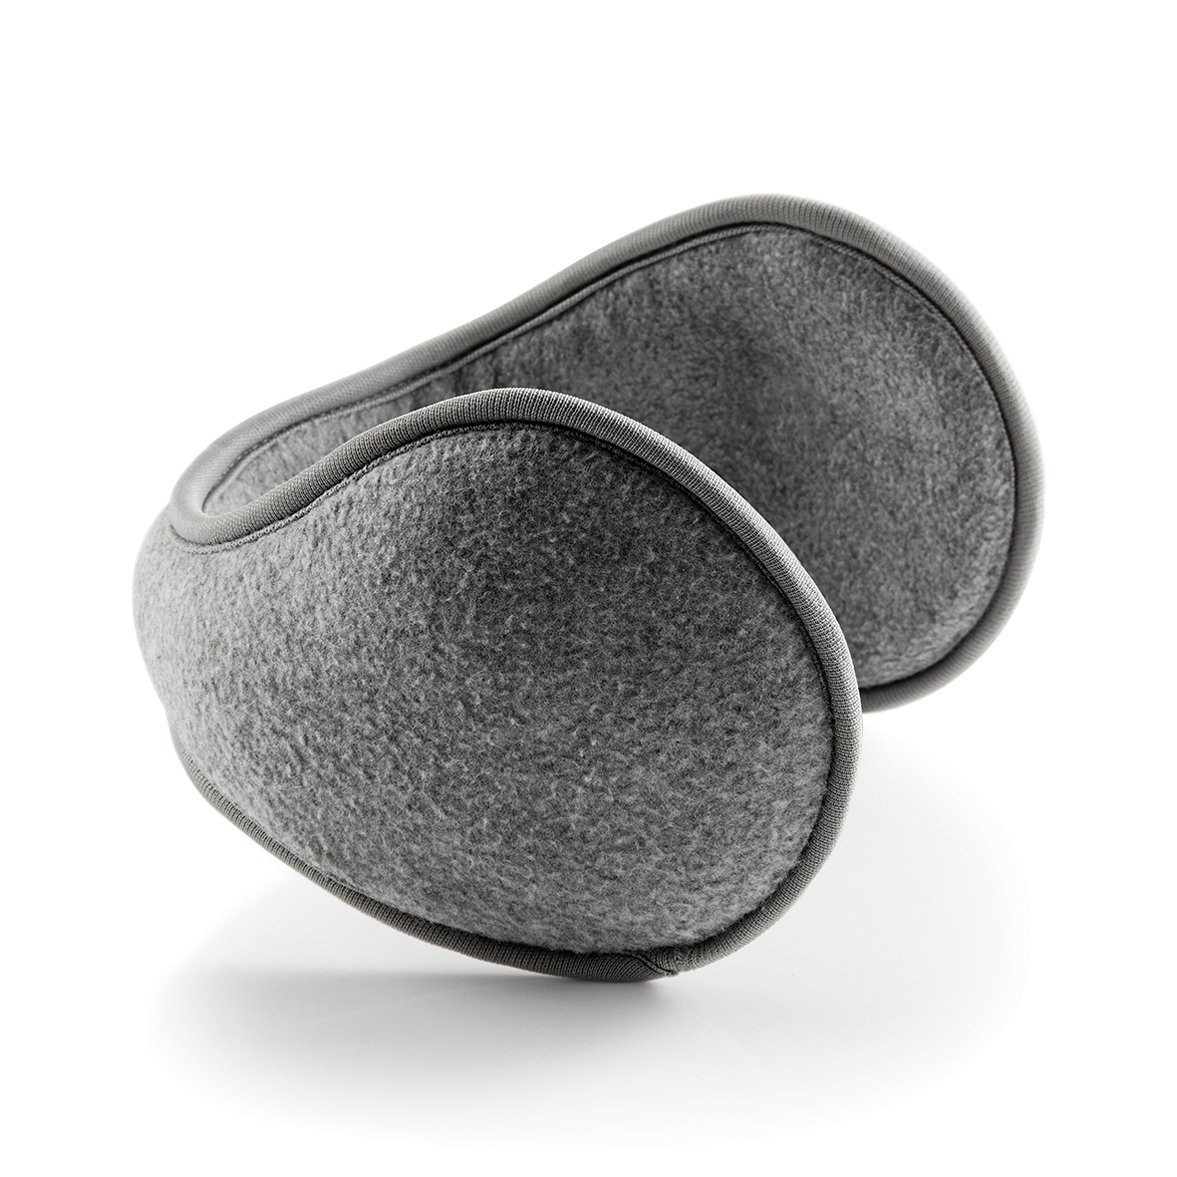 Beechfield Suprafleece Anti-Pilling Unisex Winter Ear Muffs UTRW2021_2